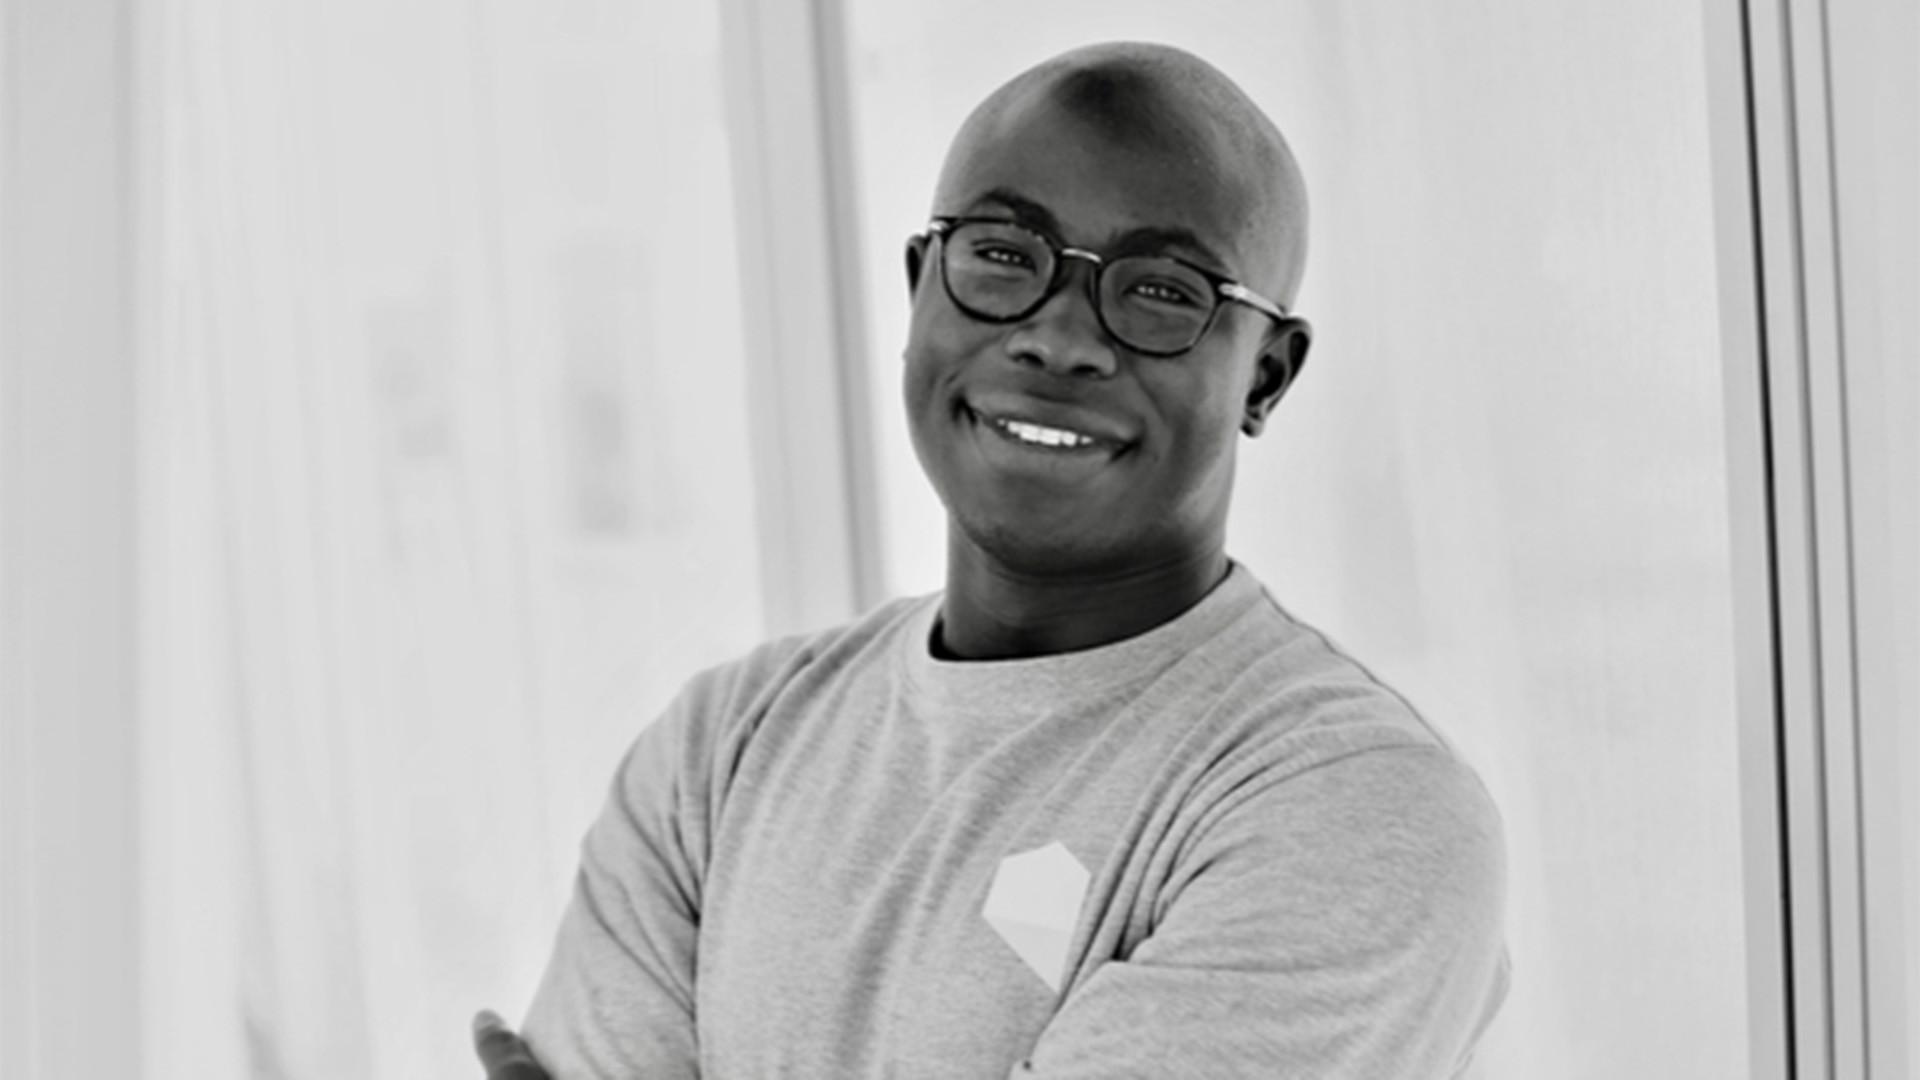 Leon Ifayemi Founder of SPCE